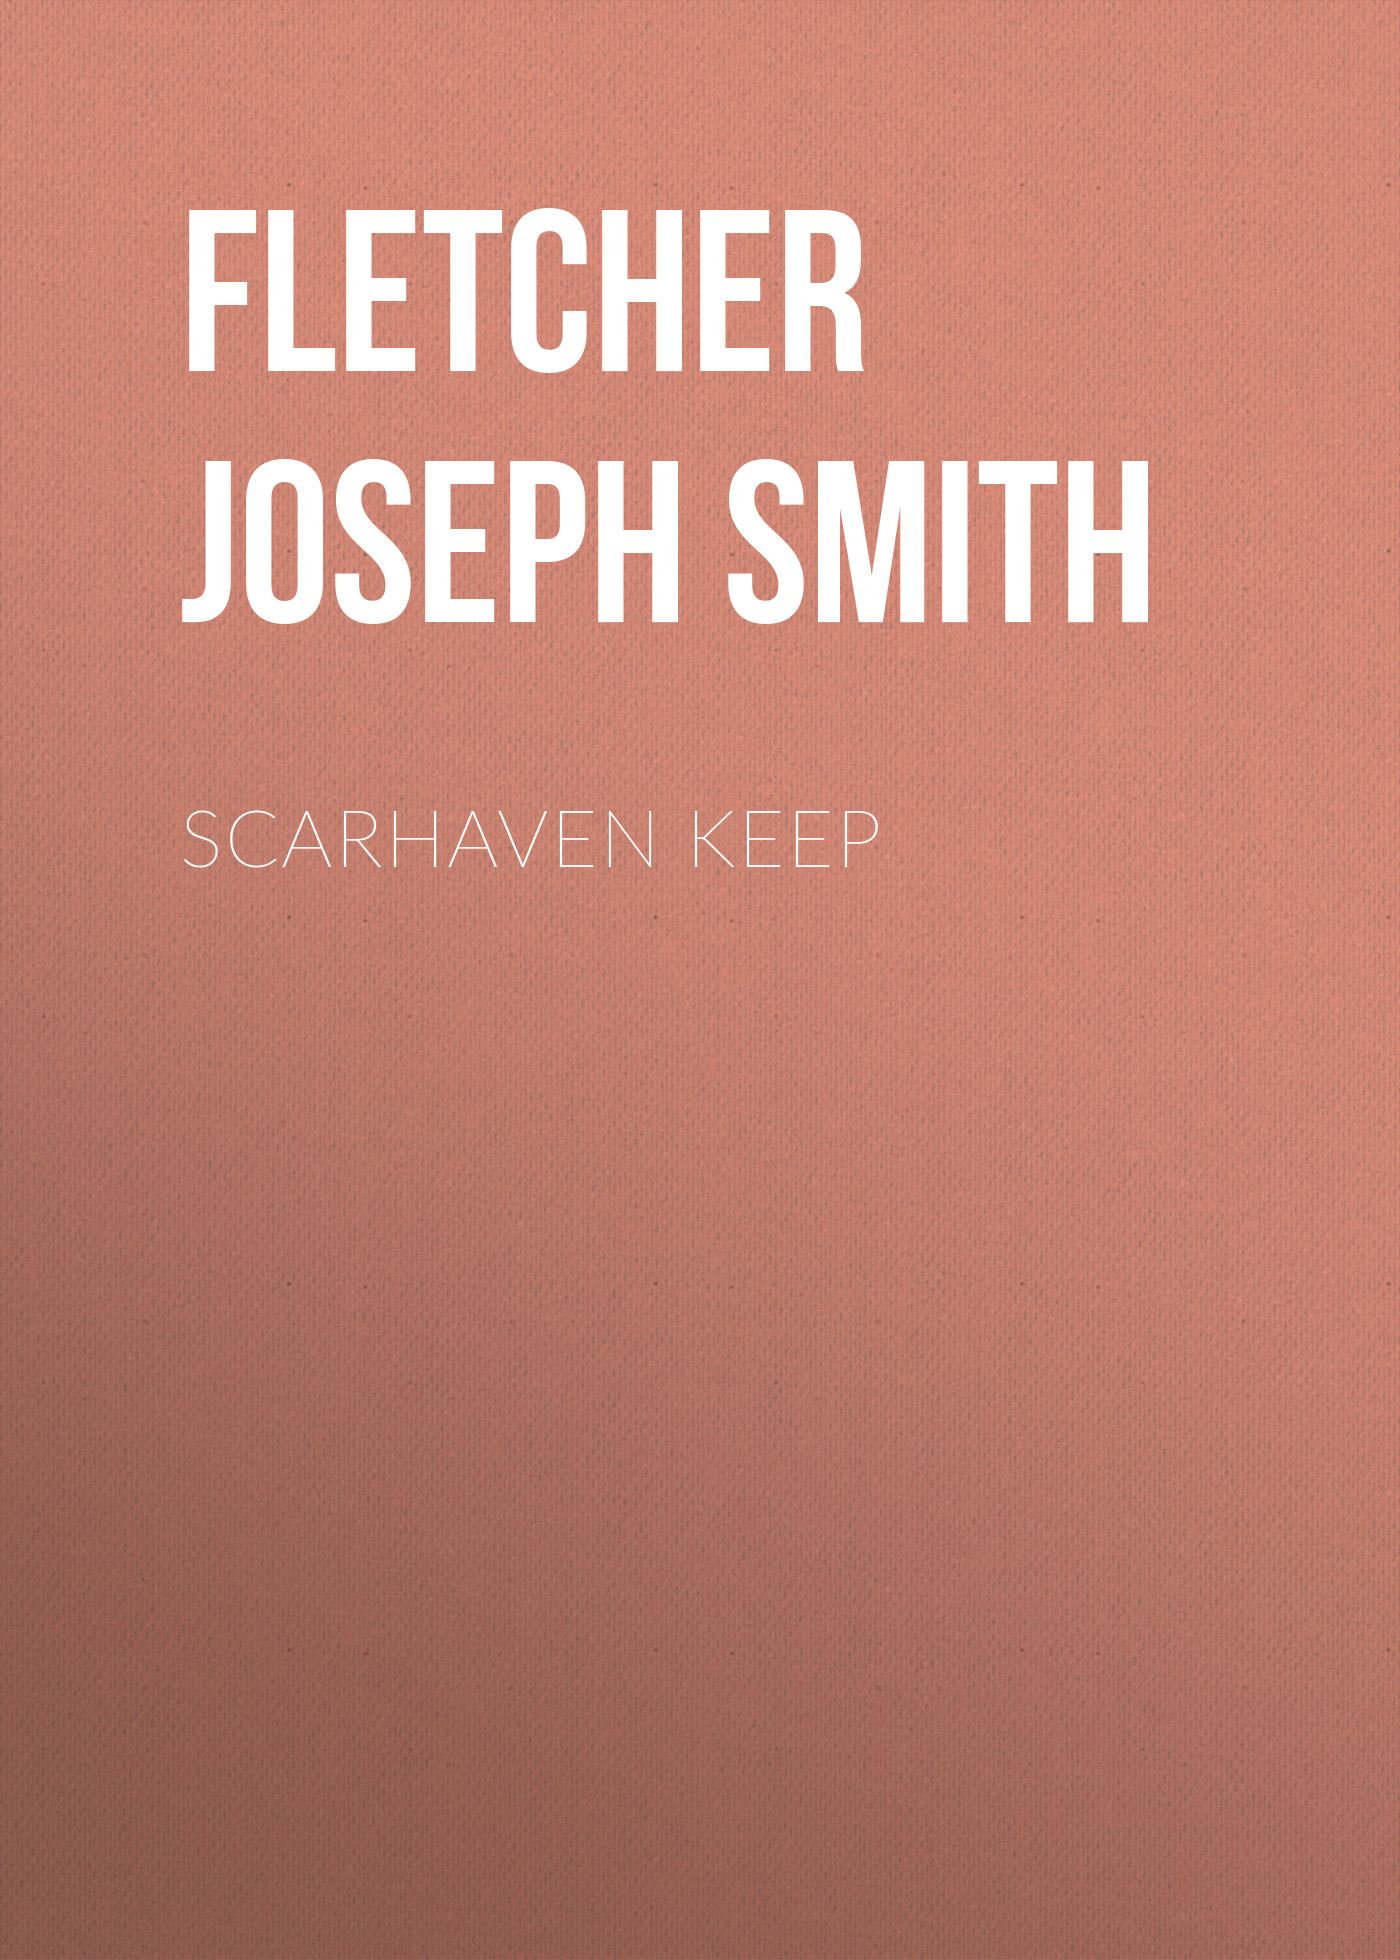 Fletcher Joseph Smith Scarhaven Keep fletcher joseph smith in the days of drake